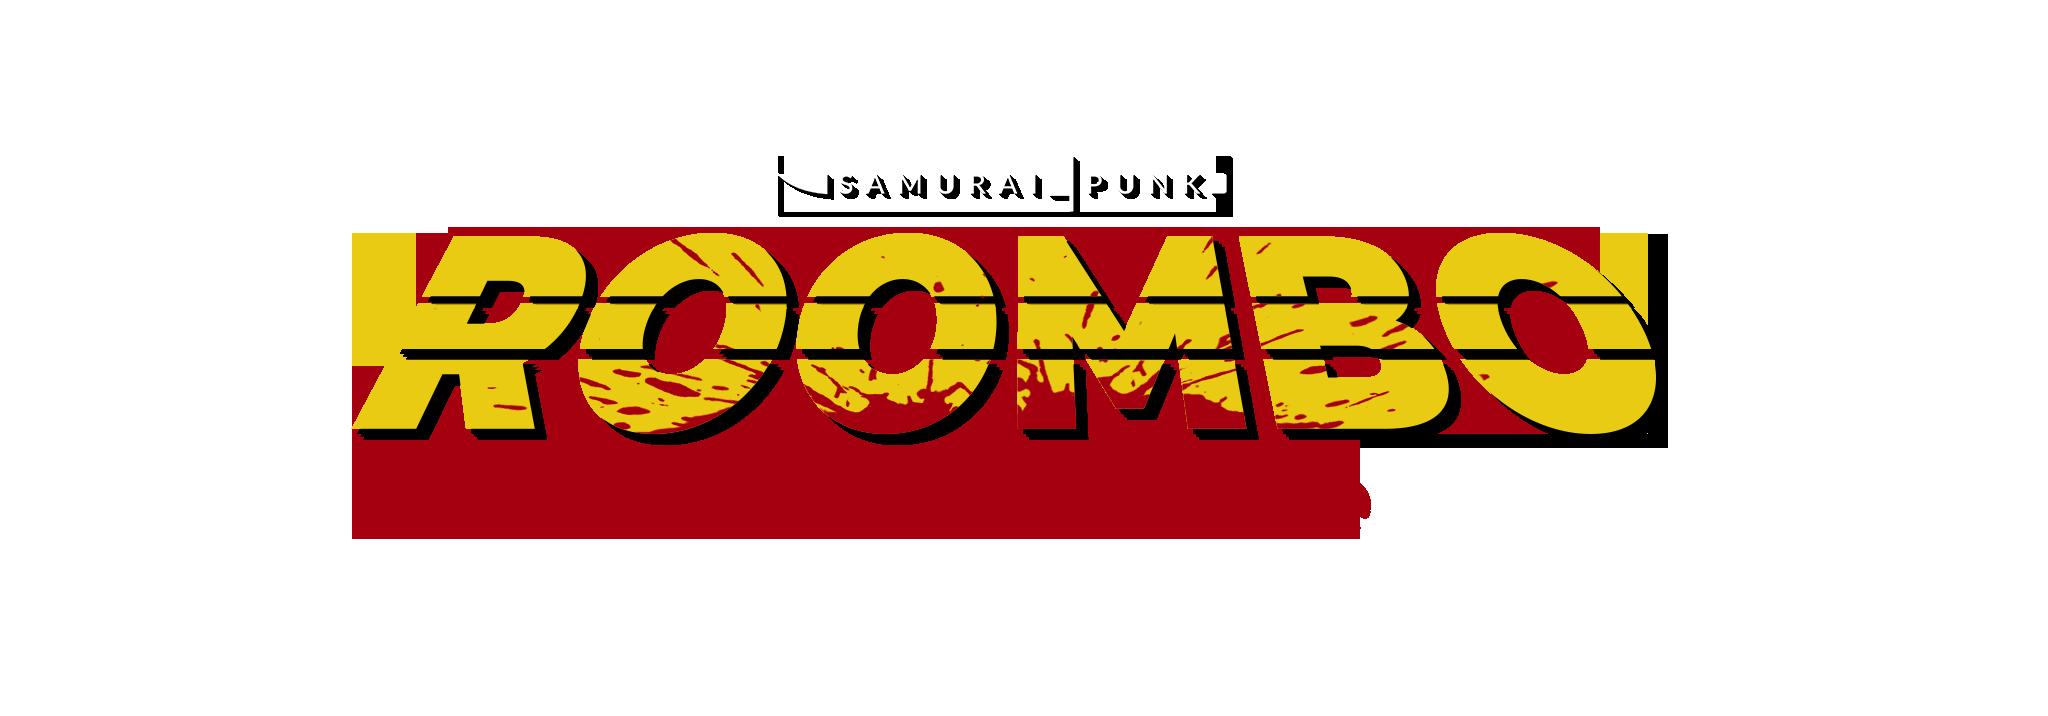 Roombo_Logo _ FINAL.png